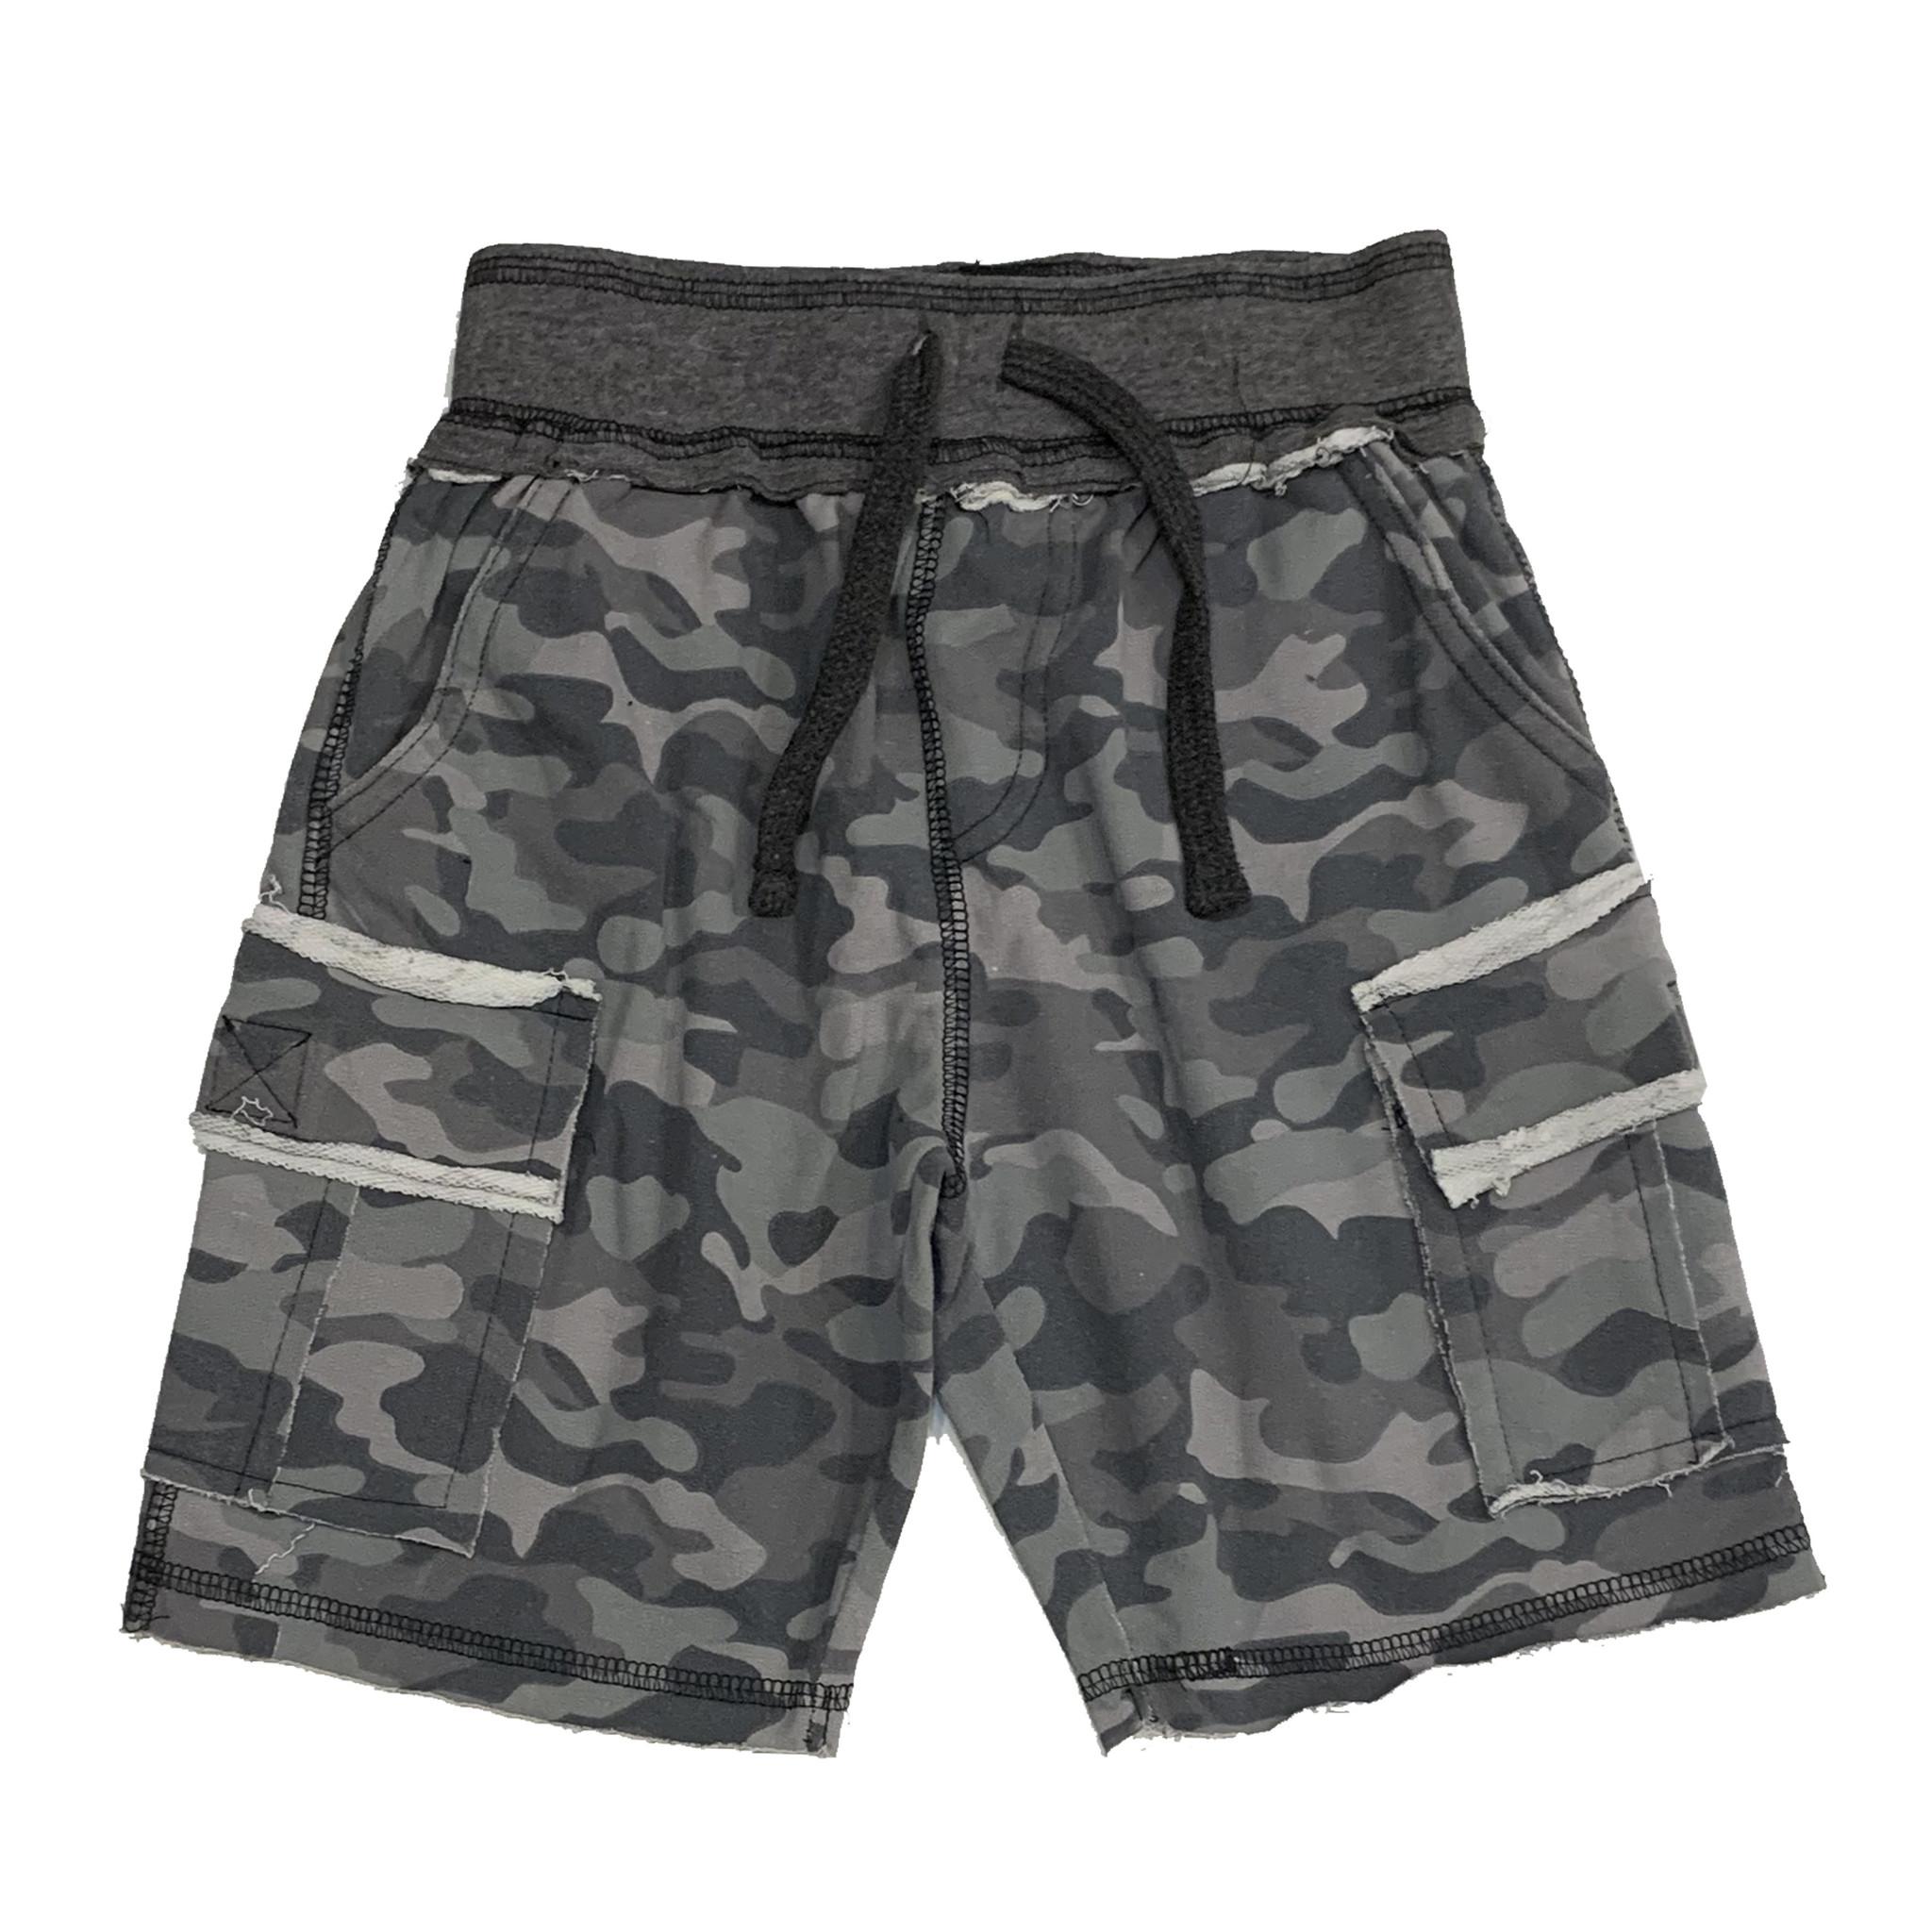 Mish Black Camo Infant Shorts